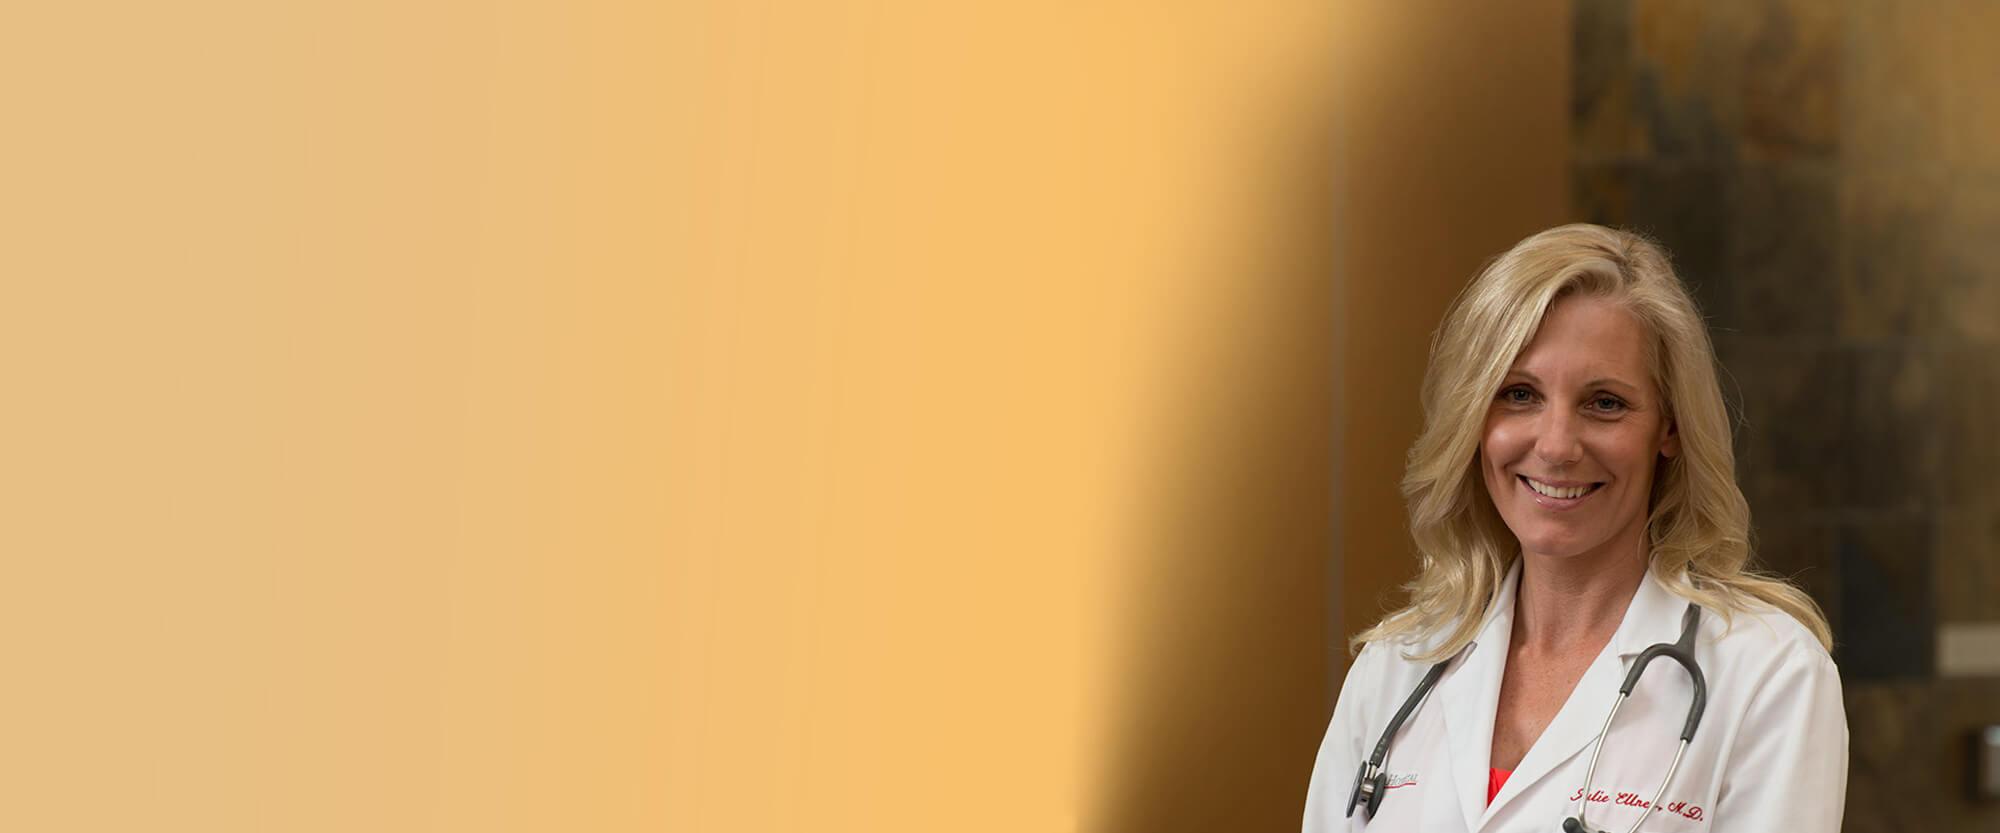 Julie A. Ellner, MD, Bariatric Surgery